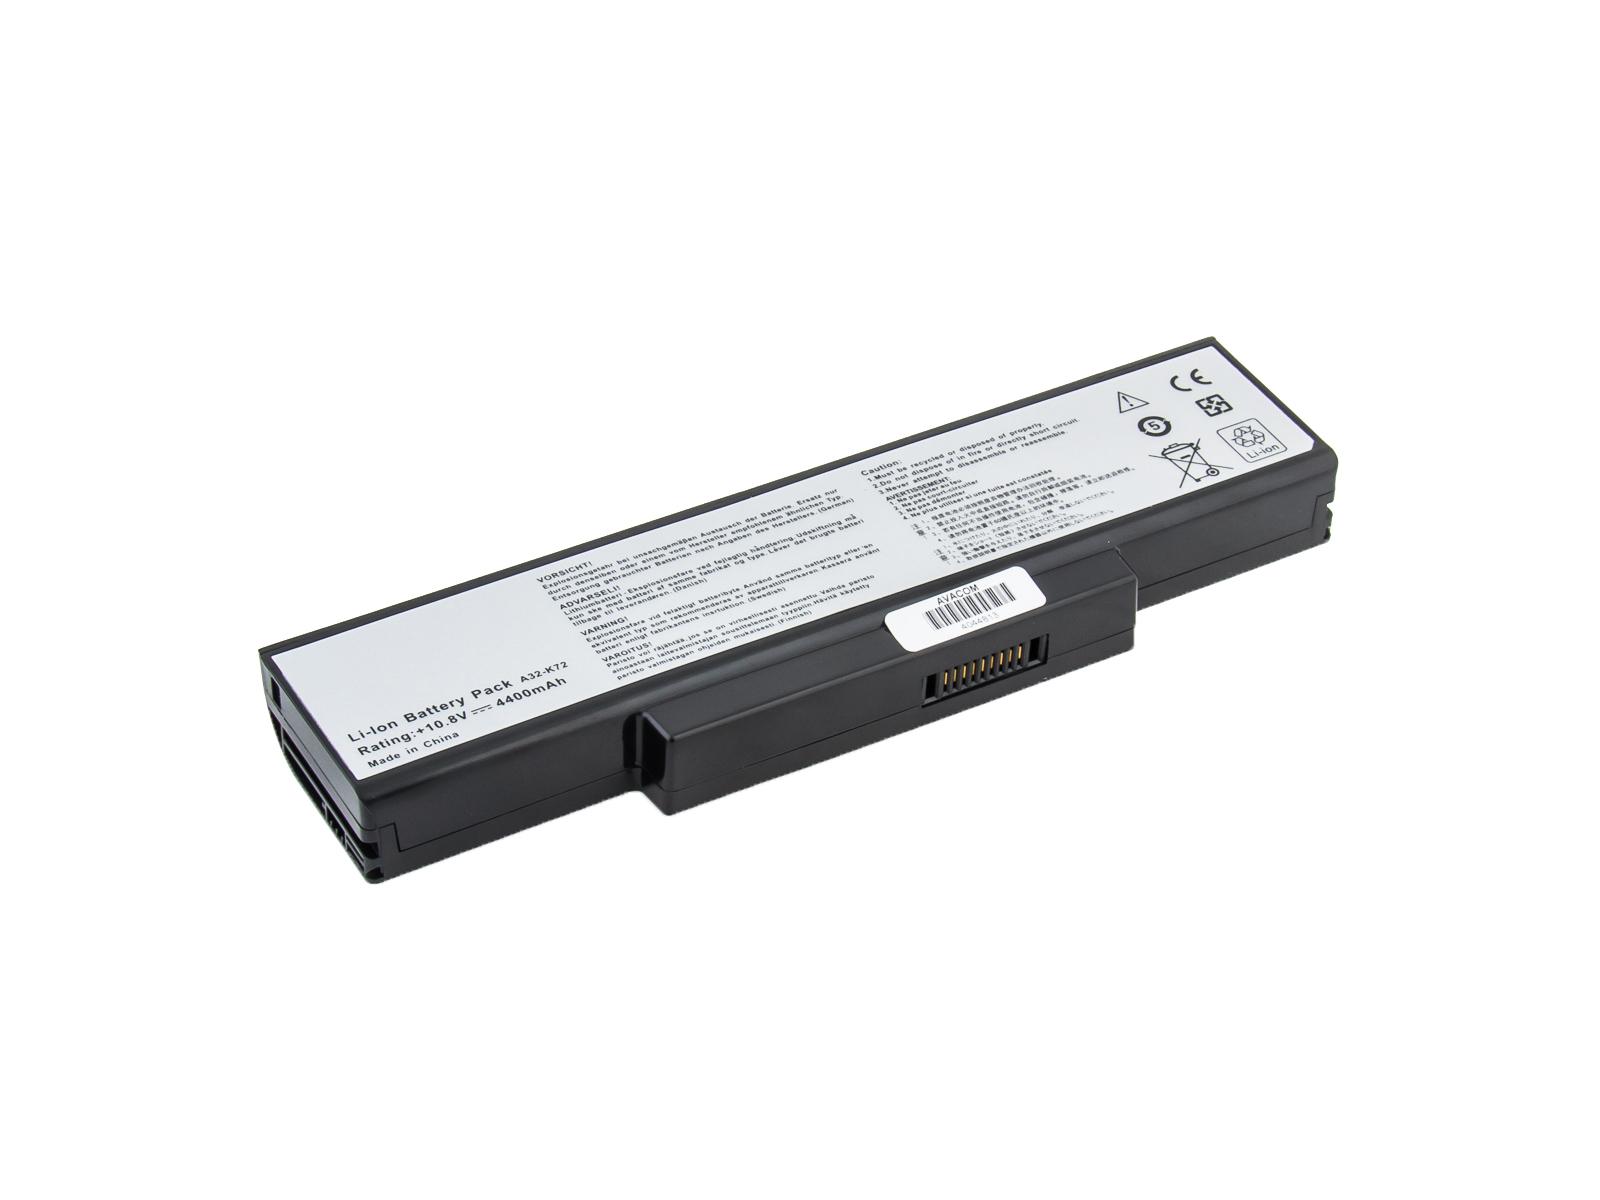 AVACOM baterie pro Asus A72/K72/N71/N73/X77 Li-Ion 11,1V 4400mAh